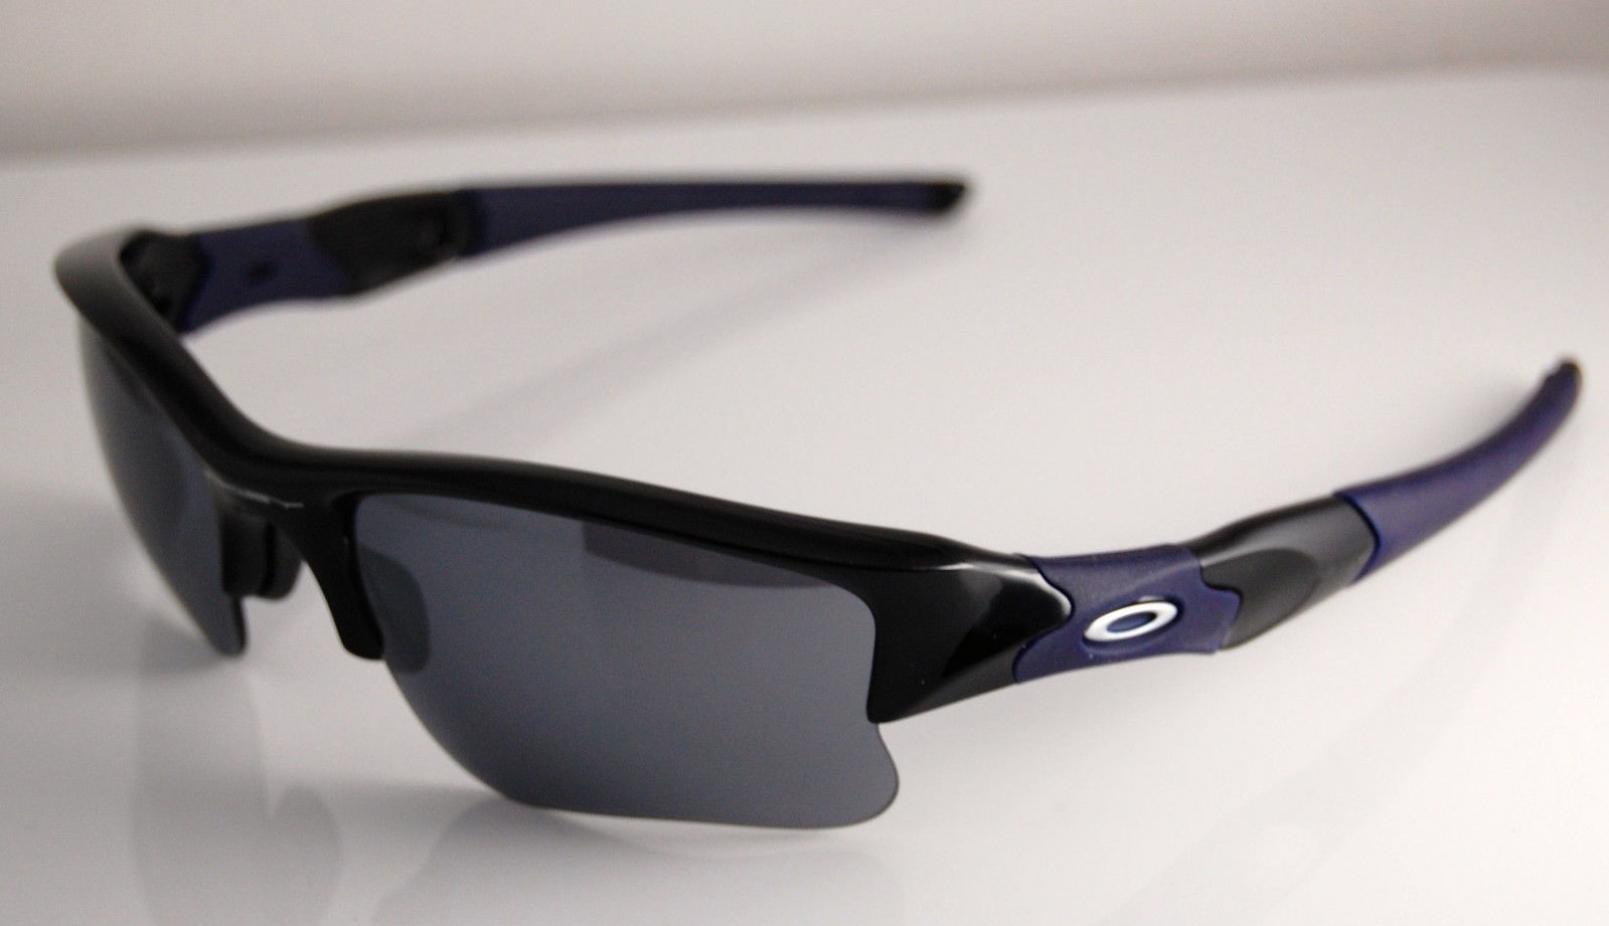 c5c1a01ff77 Camouflage Oakley Sunglasses Ebay